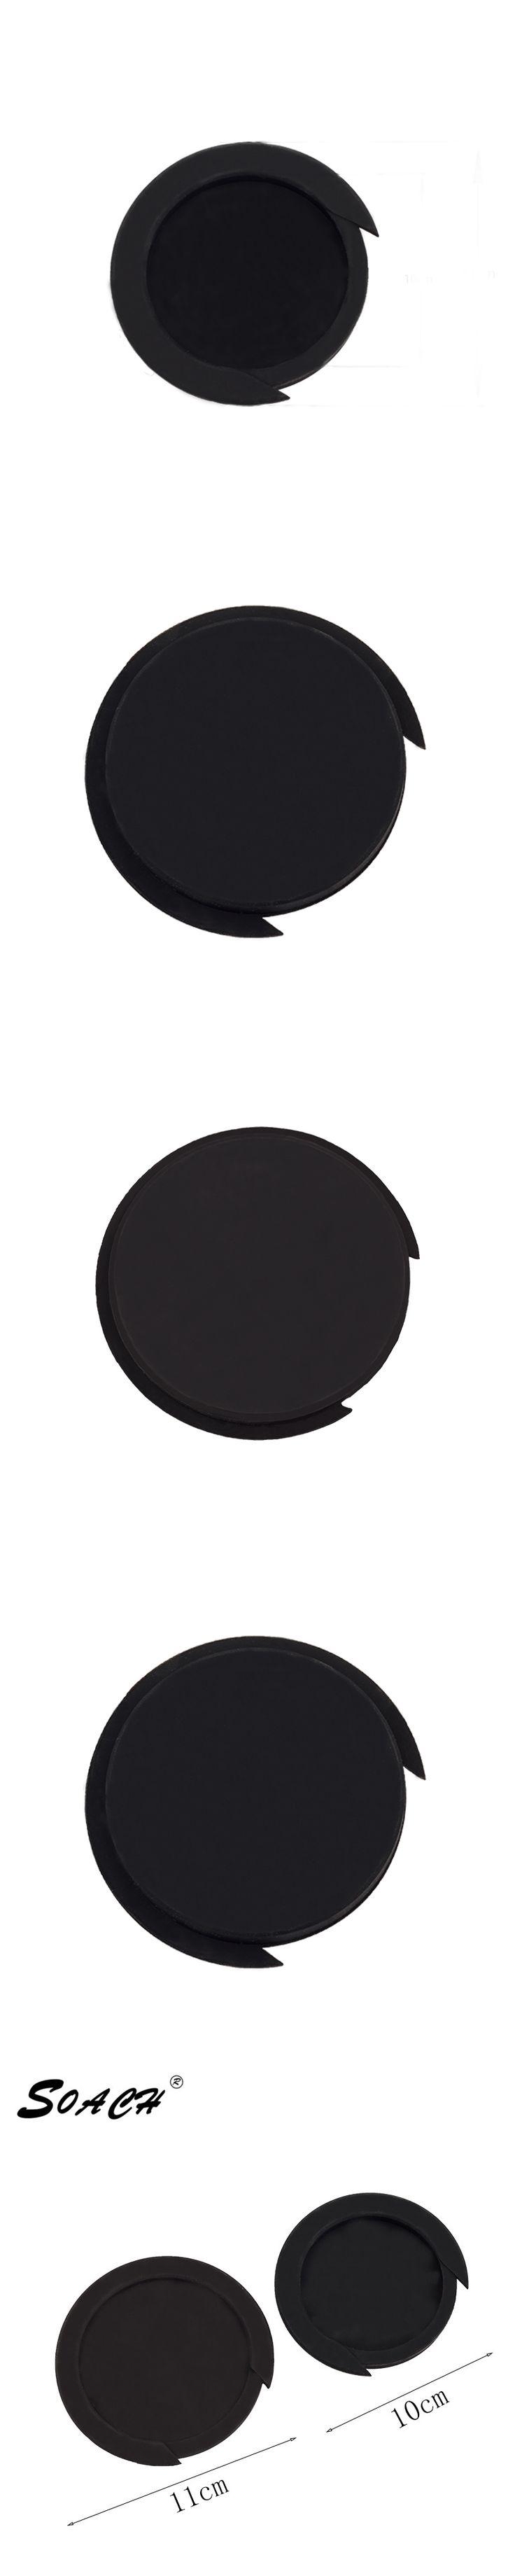 SOACH Black Rubber 11cm/10cm Guitar Sound Hole Acoustic Guitar Accessories Cover High Quality Guitar Sound Hole Block